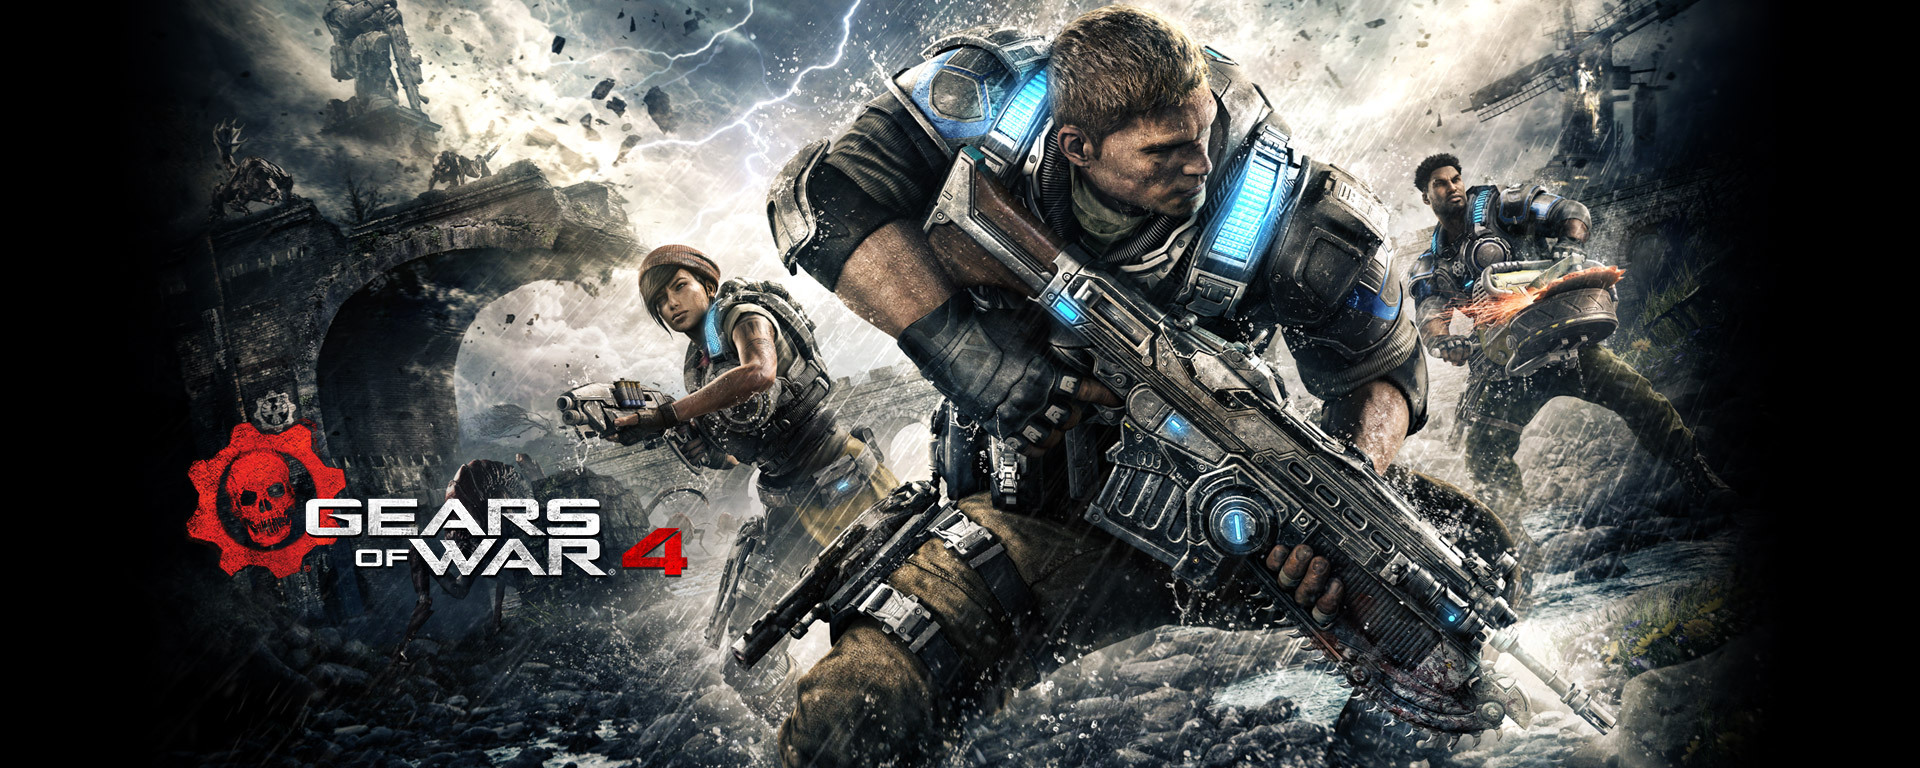 Gears Of War 4 Widescreen